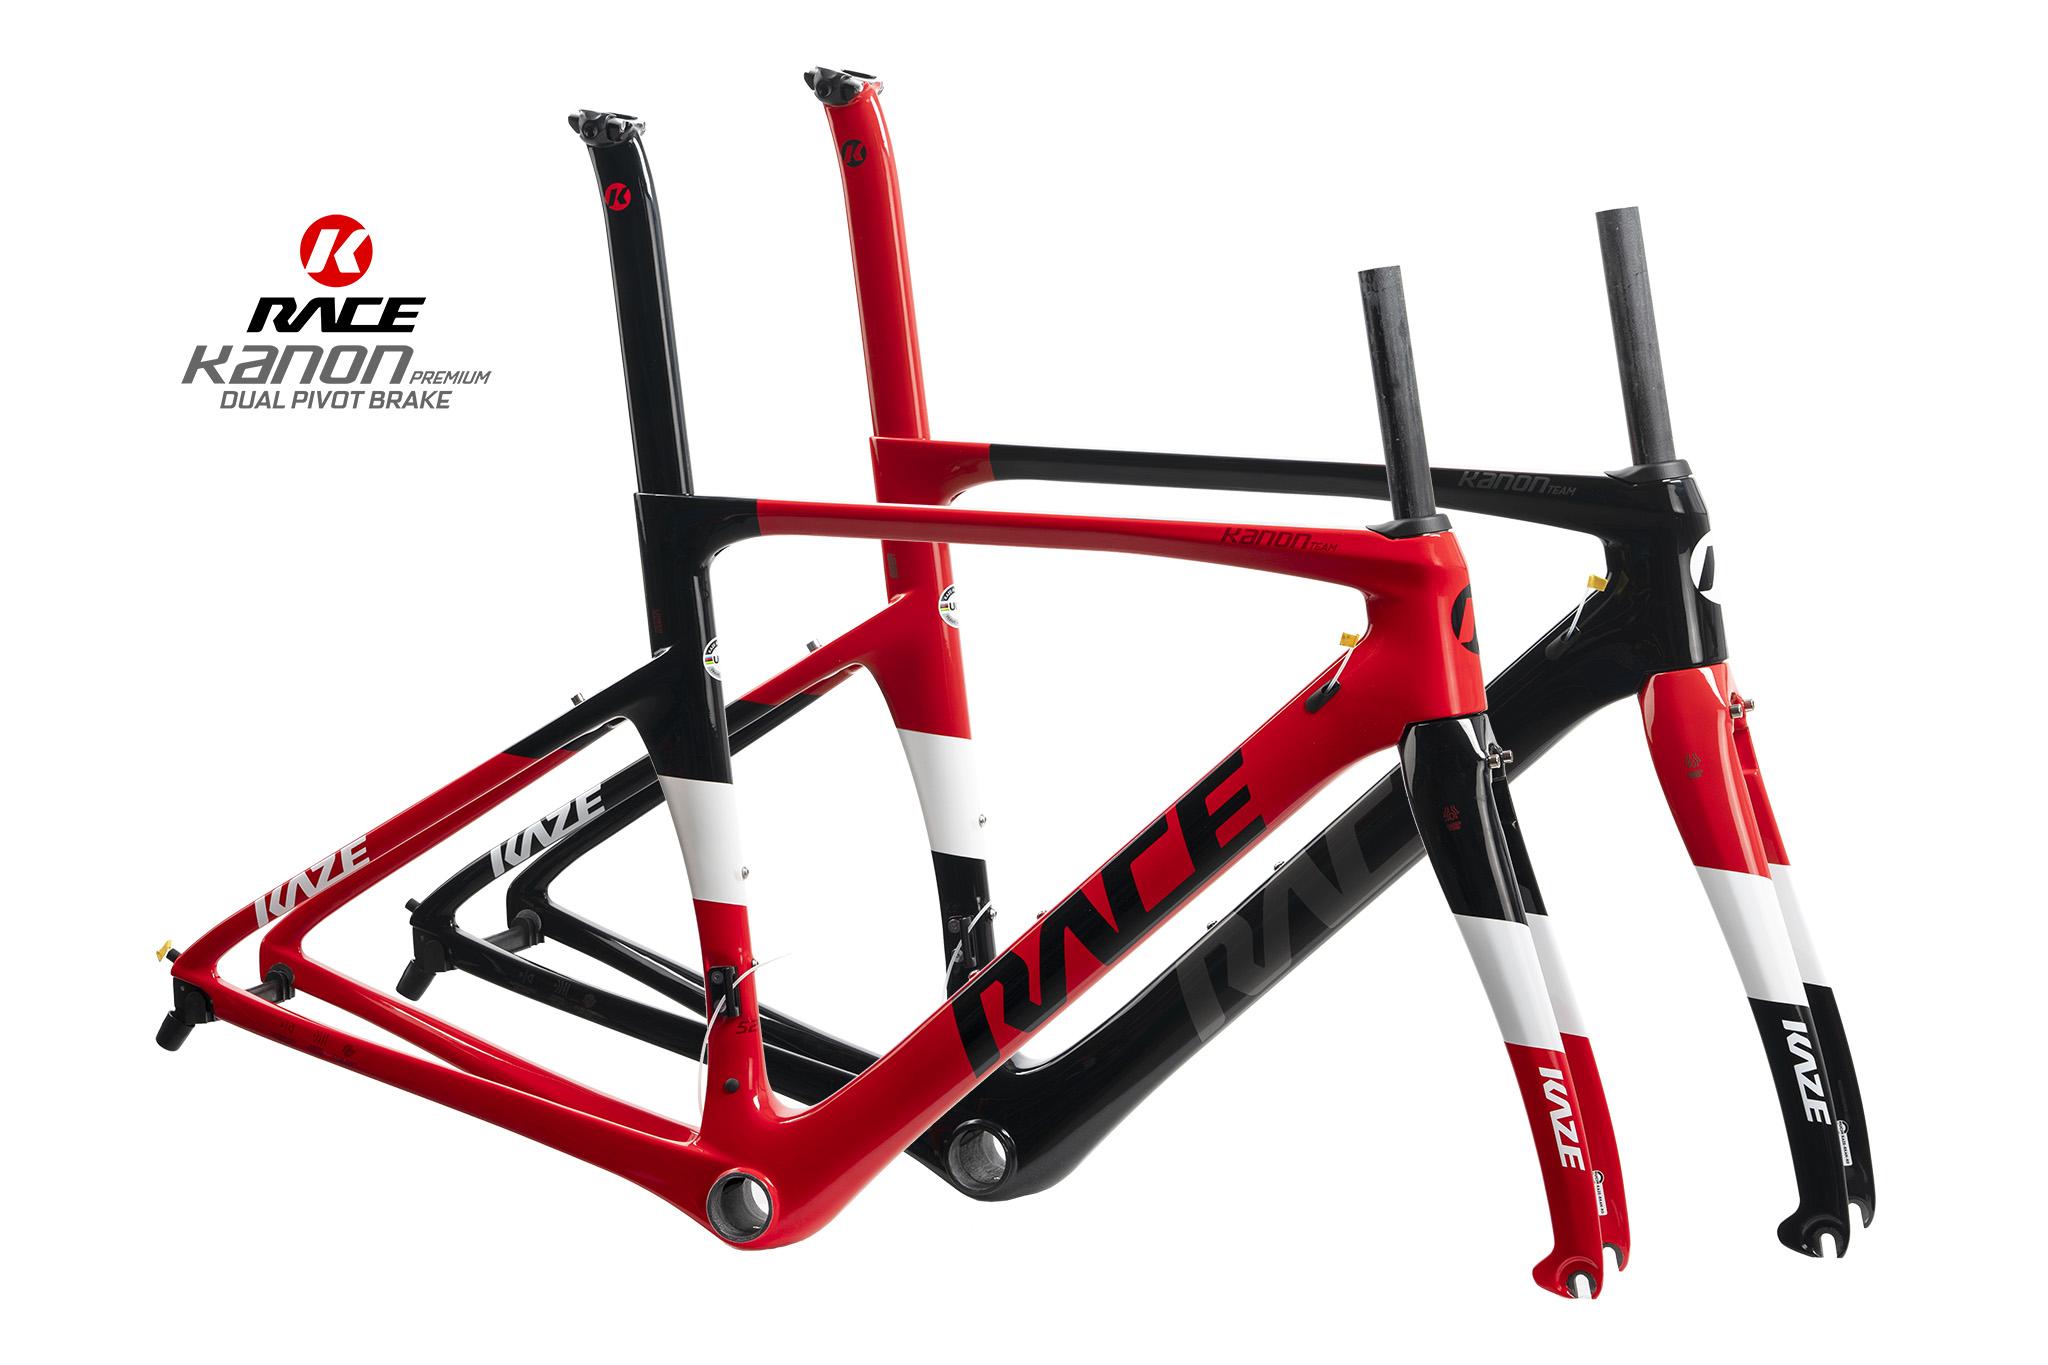 KAZE RACE | KANON Team(Frame set) Direct mount